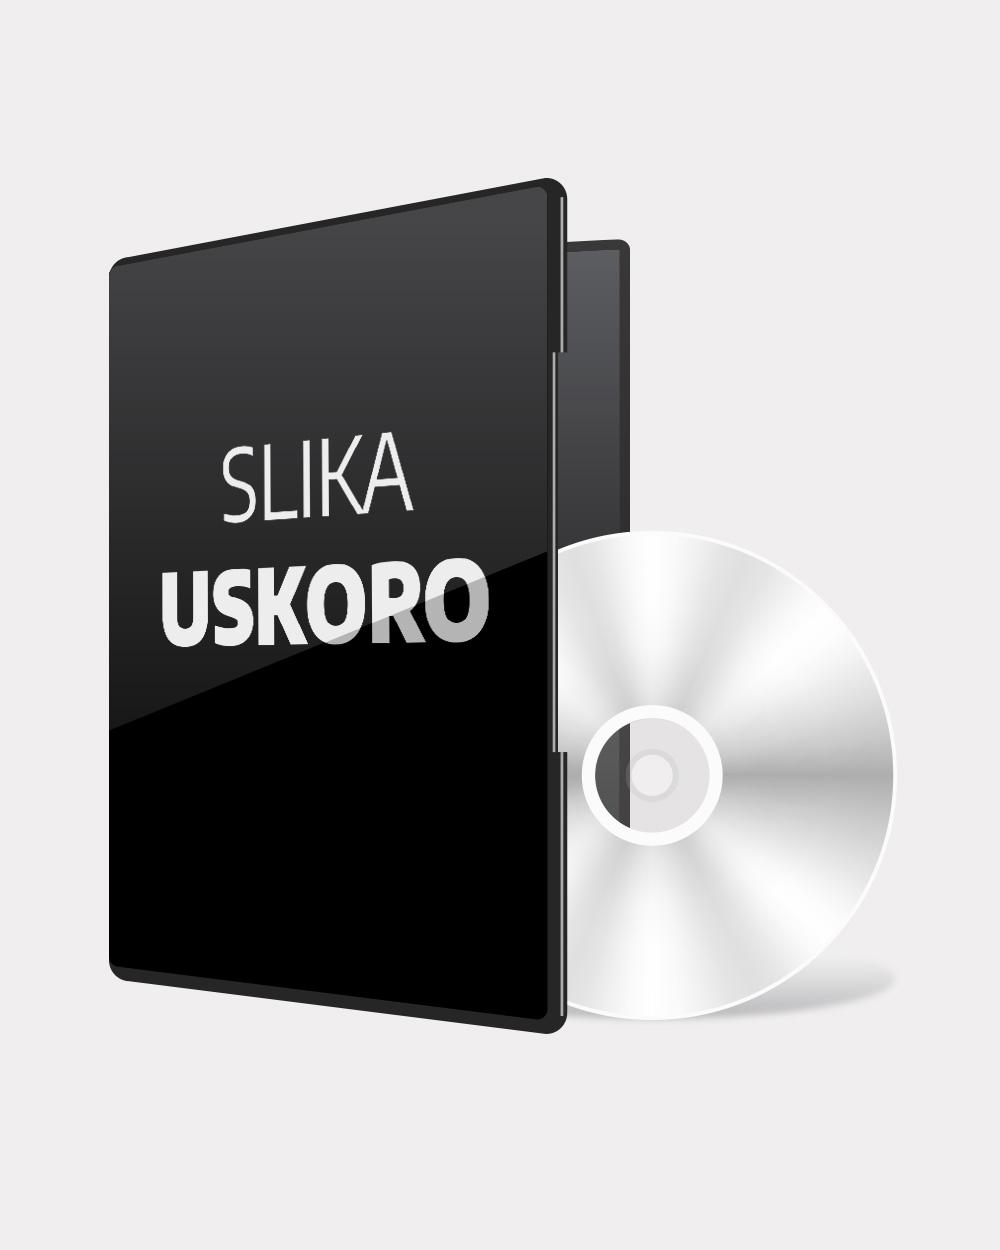 PS4 Deception IV - The Nightmare Princess